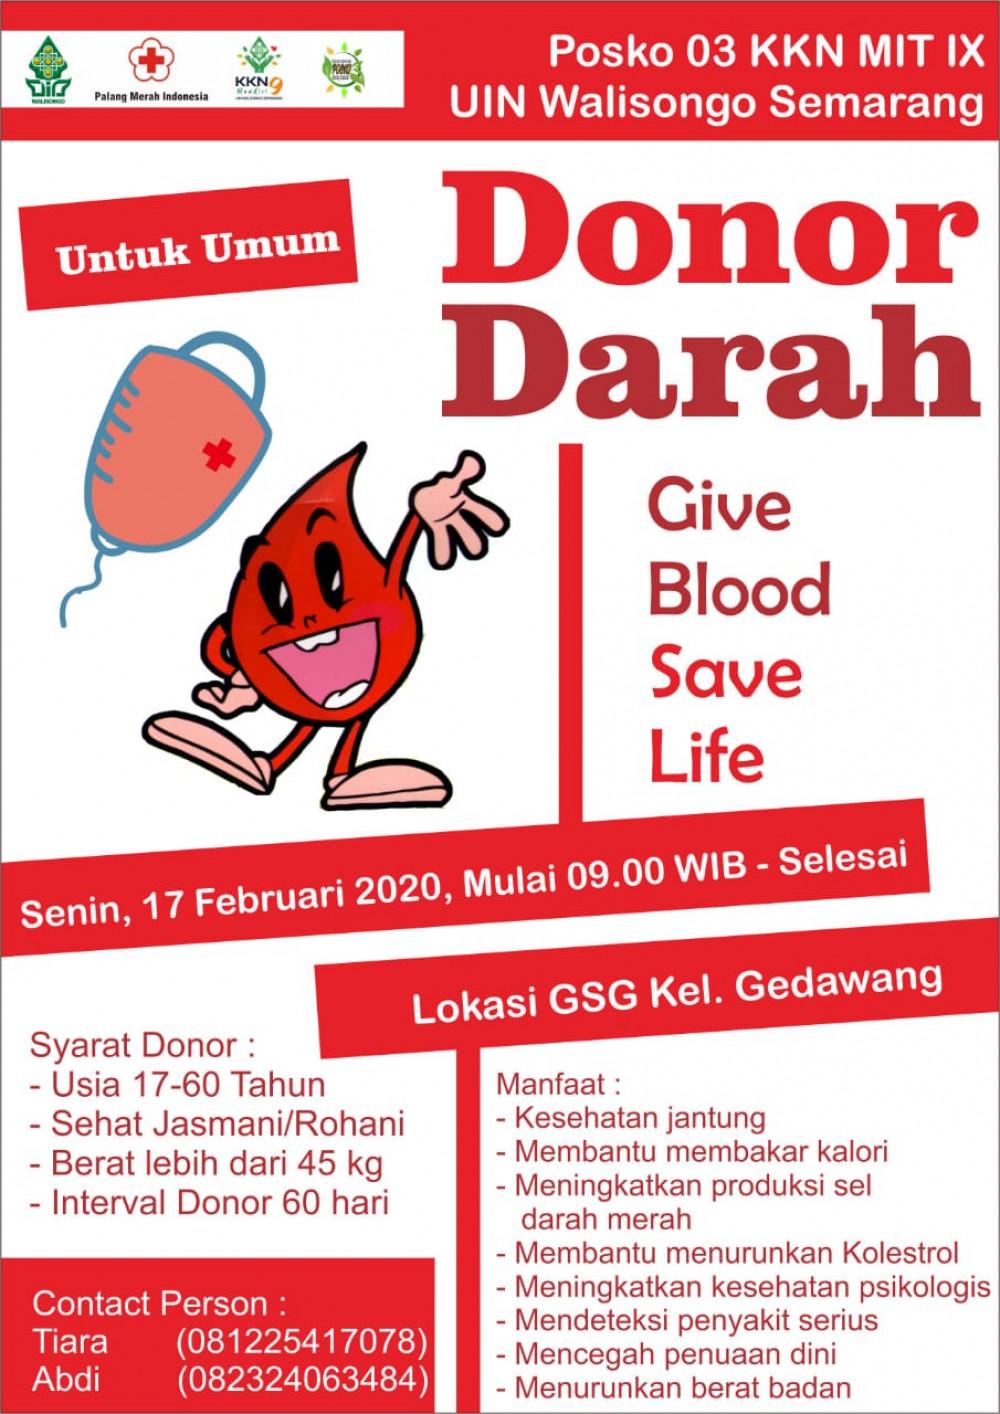 Donor Darah KKN MIT IX UIN Walisongo Semarang